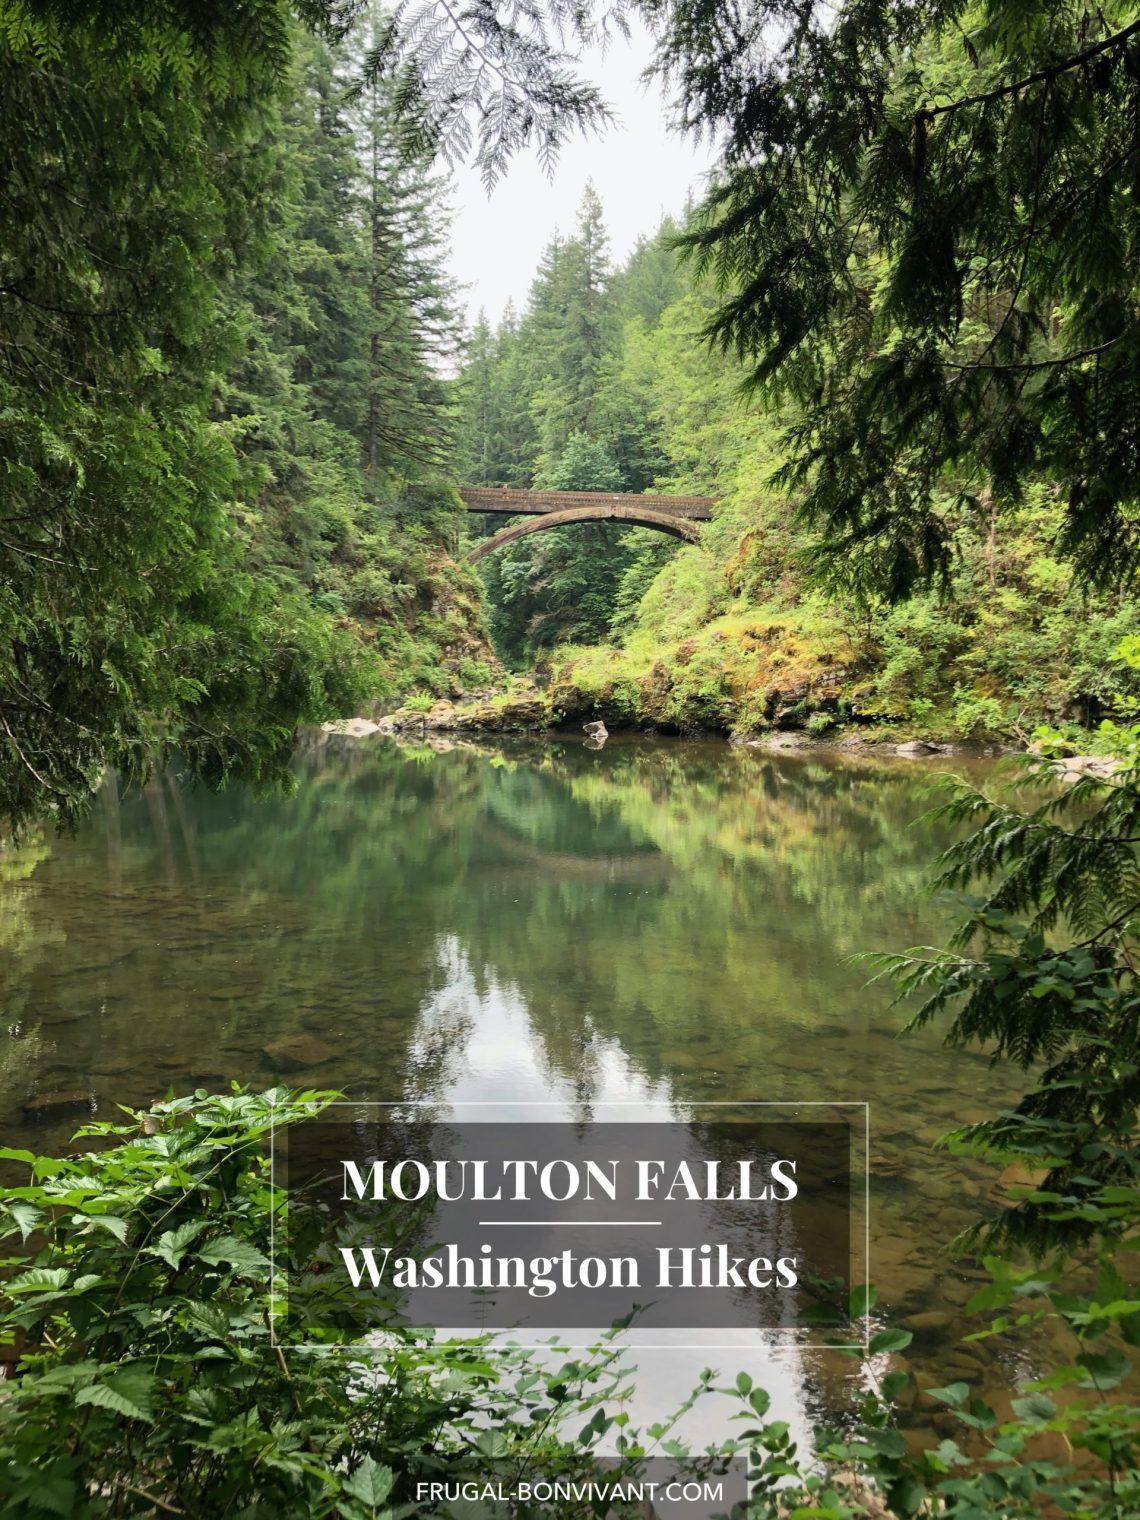 Moulton Falls Washington Hikes